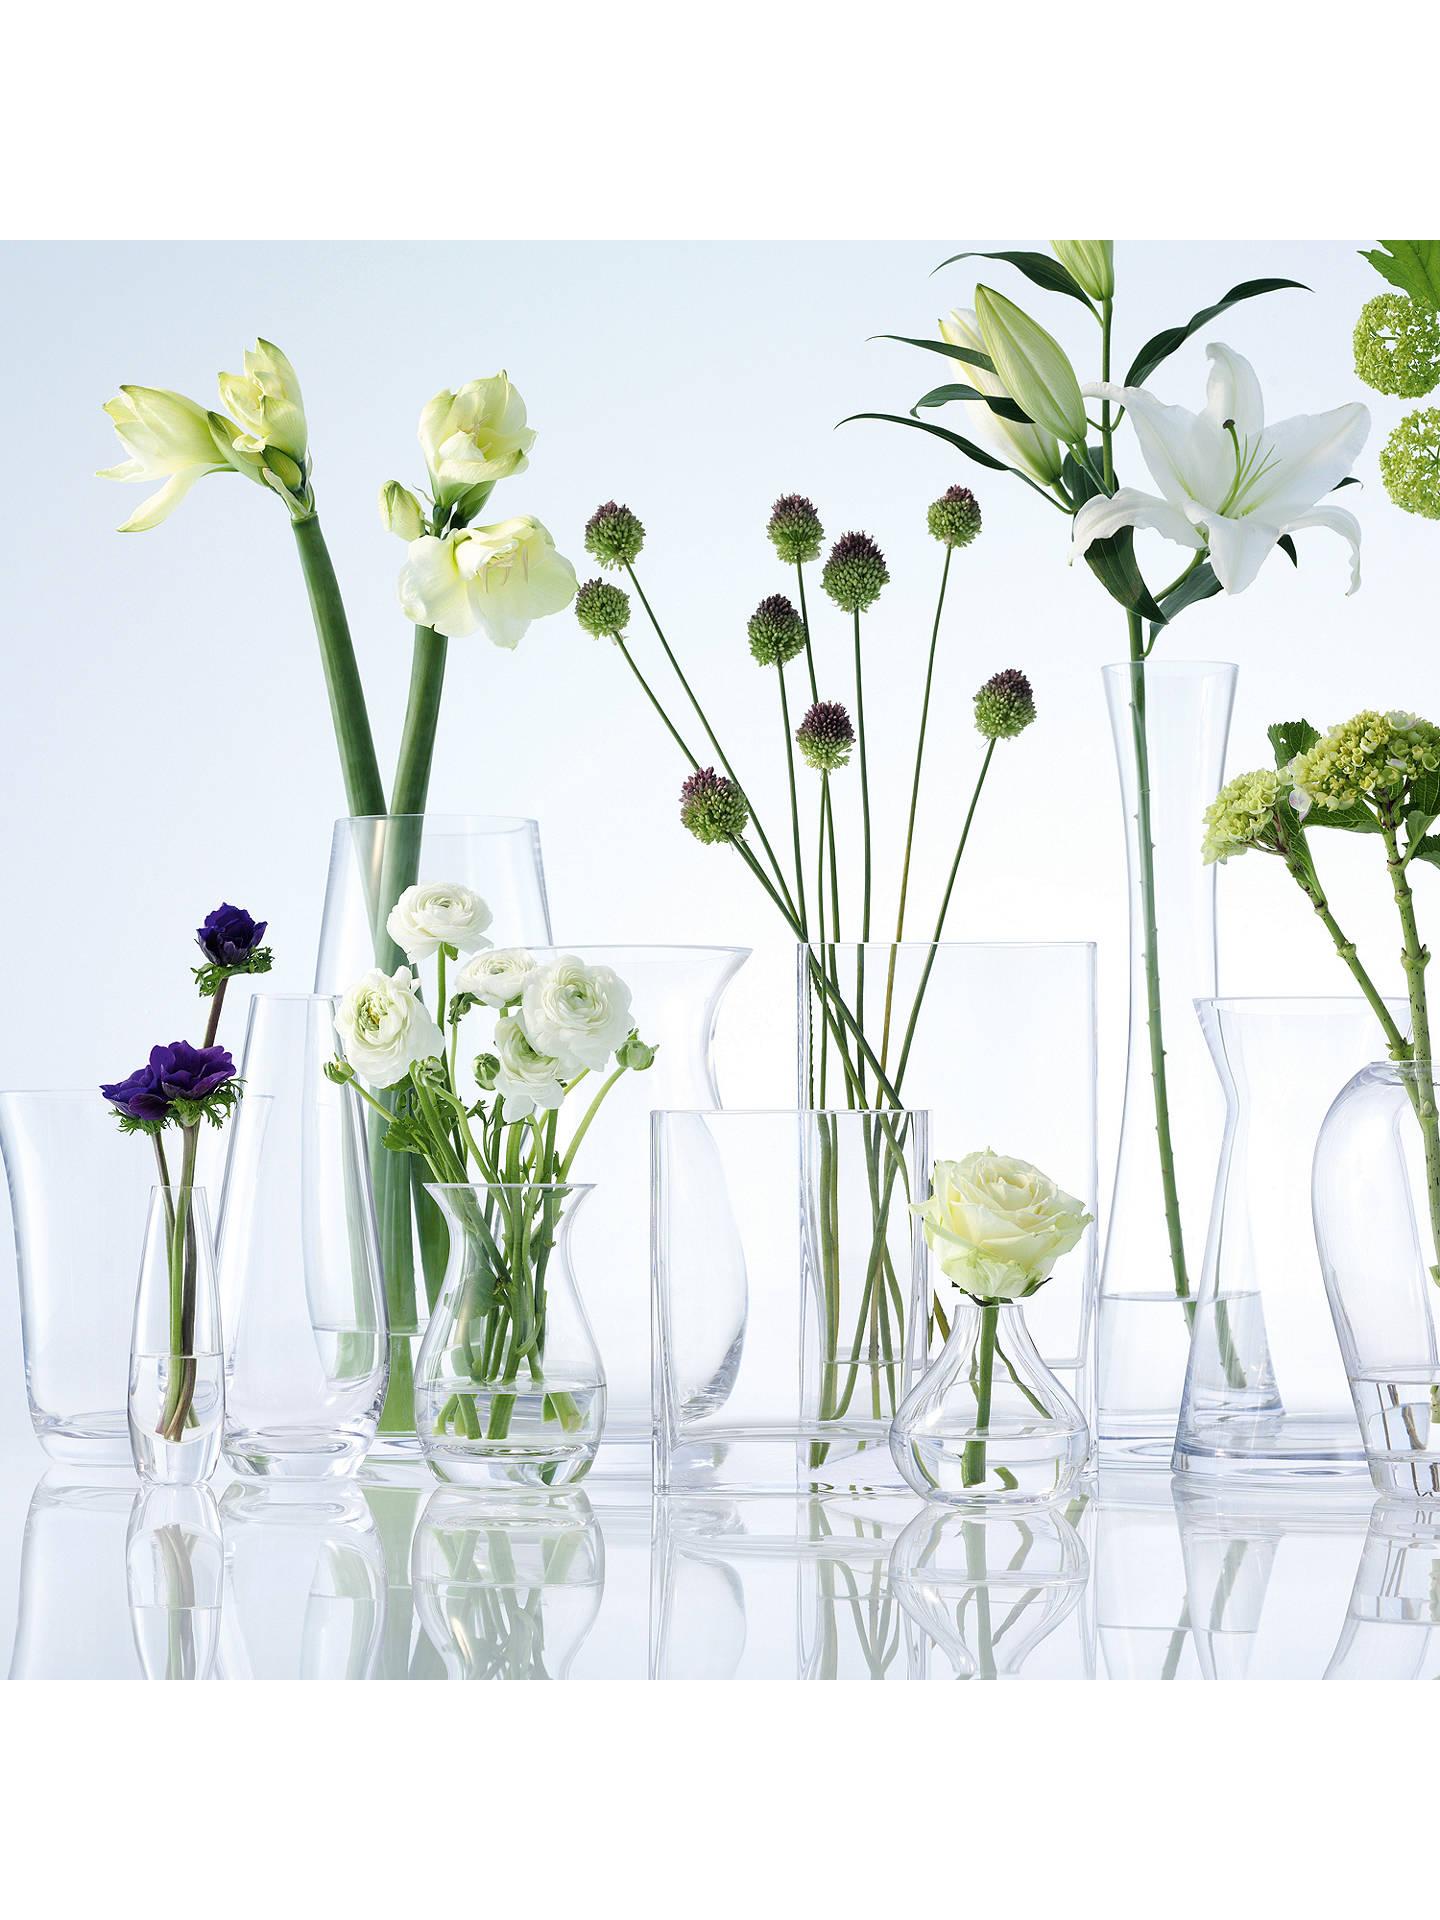 ... Buy LSA International Flower Tall Stem Vase H29cm Online at johnlewis.com  sc 1 st  John Lewis & LSA International Flower Tall Stem Vase H29cm at John Lewis \u0026 Partners